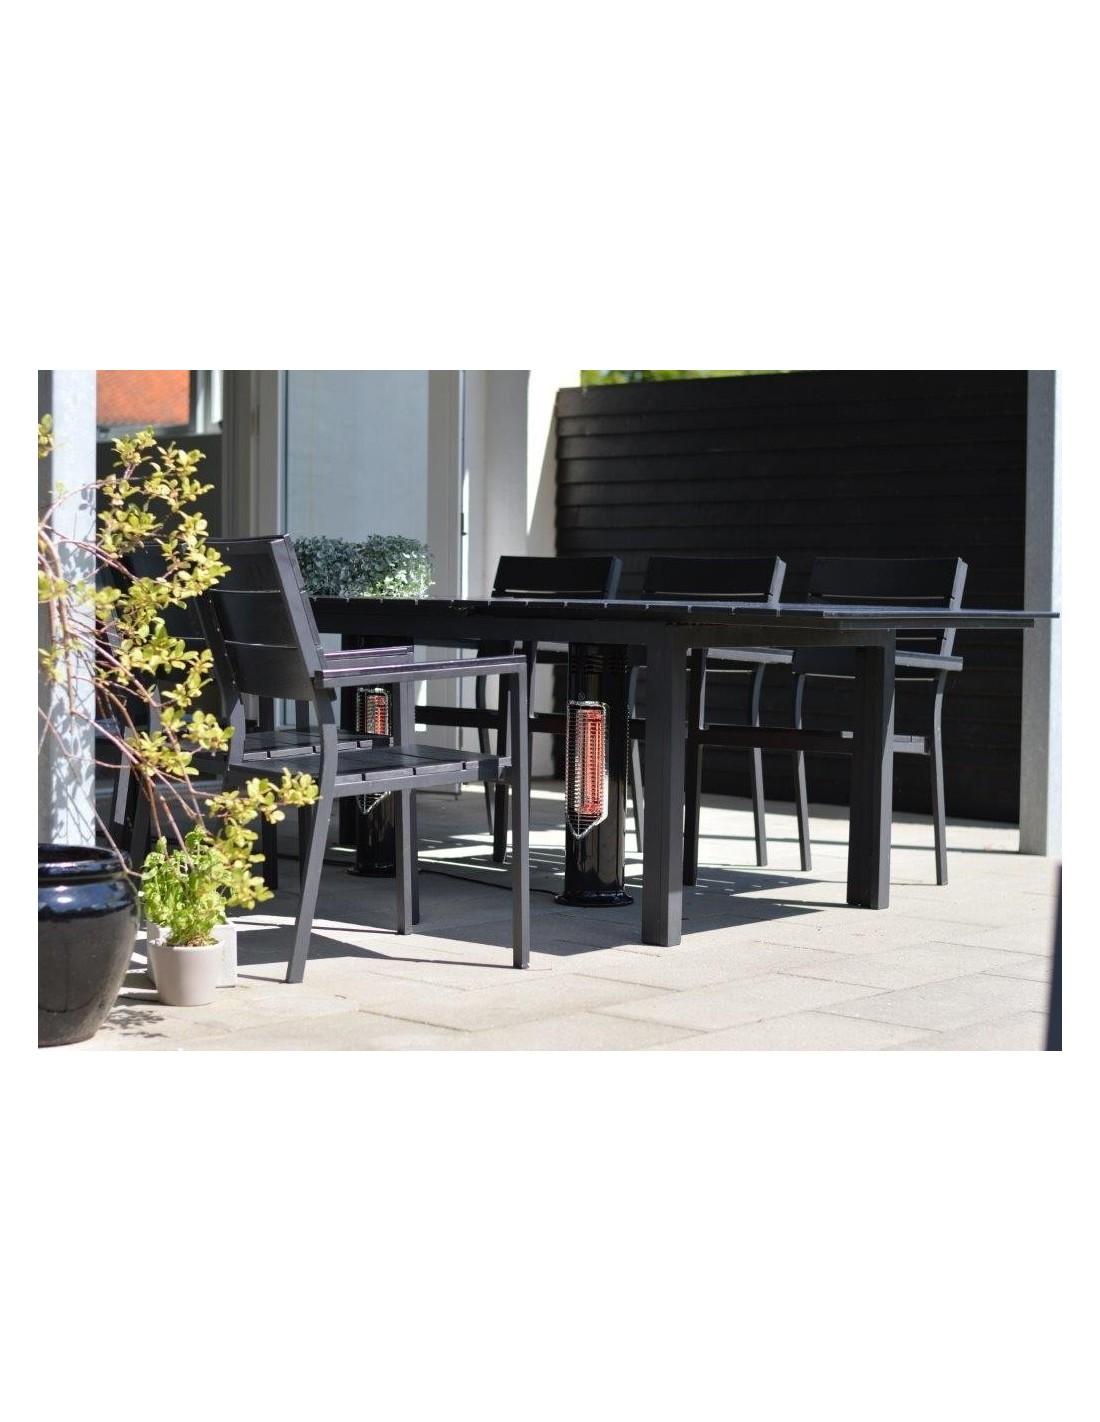 chauffage terrasse ext rieur portable lectrique chaleur infrarouge ebay. Black Bedroom Furniture Sets. Home Design Ideas